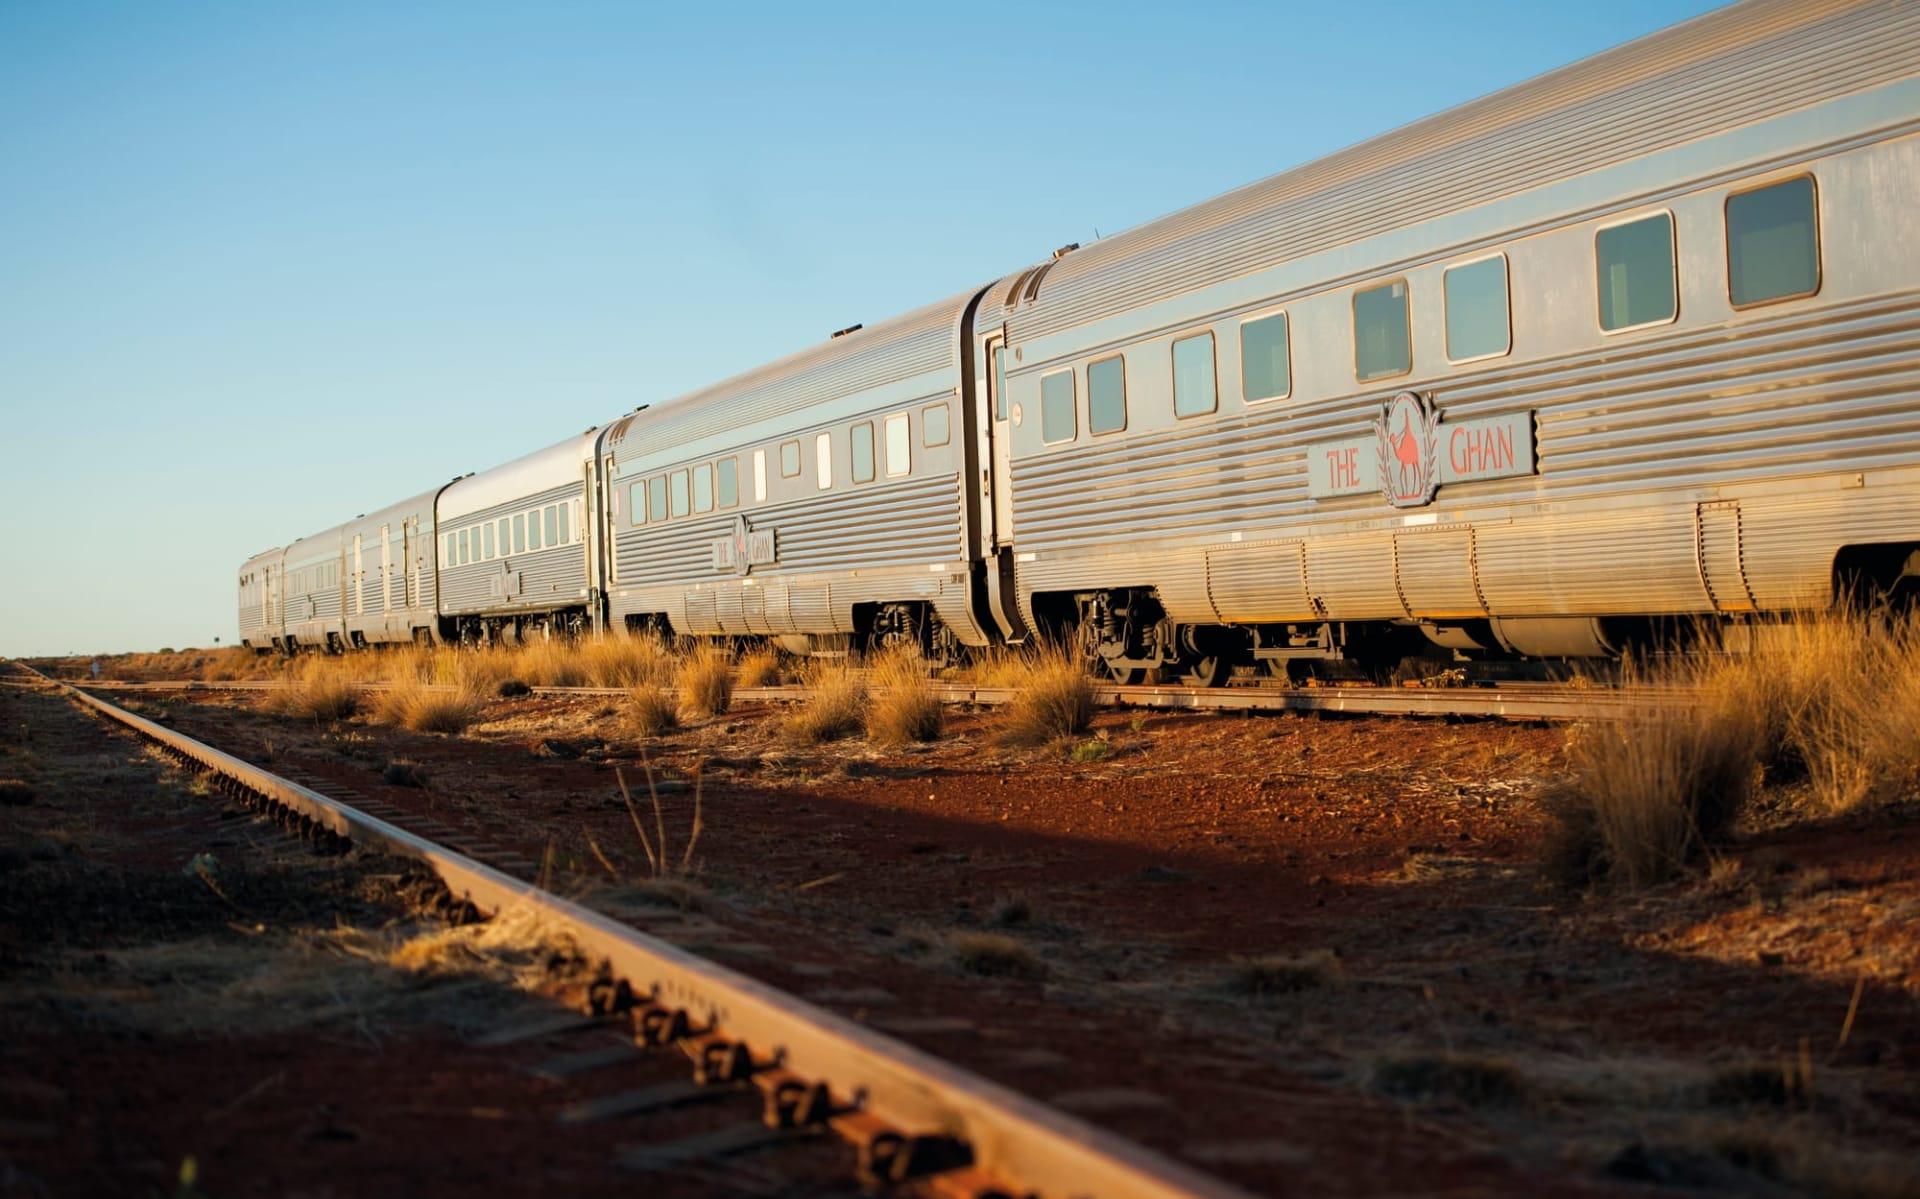 The Ghan von Darwin bis Adelaide: Australien - Bahnreisen - The Ghan Carriages beim Sonnenaufgang